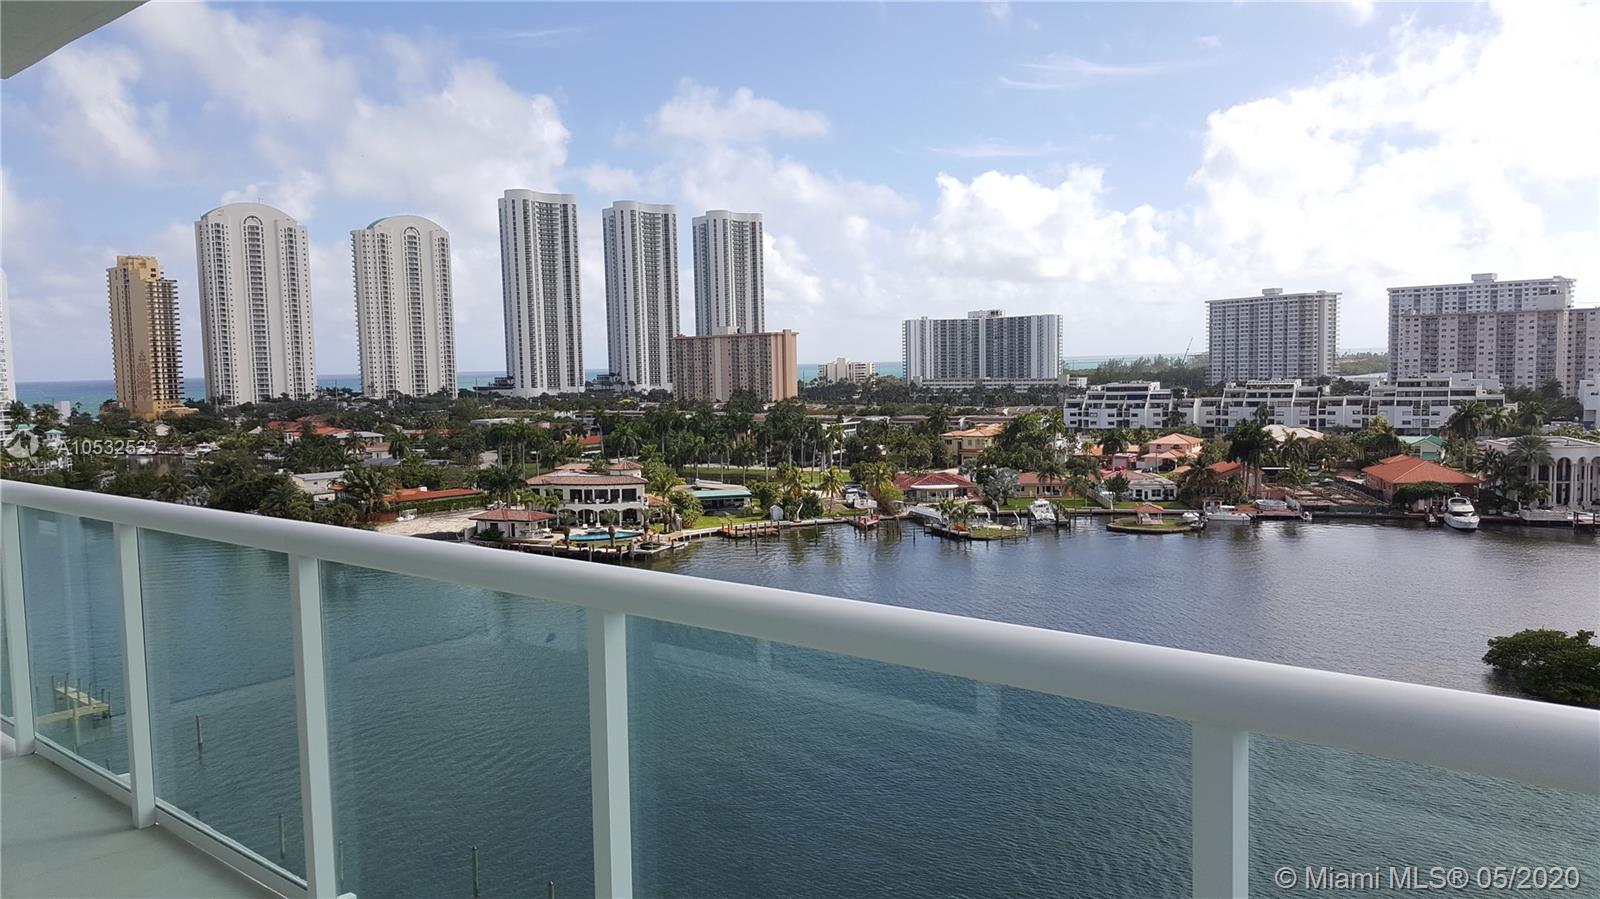 400 Sunny Isles #1001 - 400 Sunny Isles Blvd #1001, Sunny Isles Beach, FL 33160